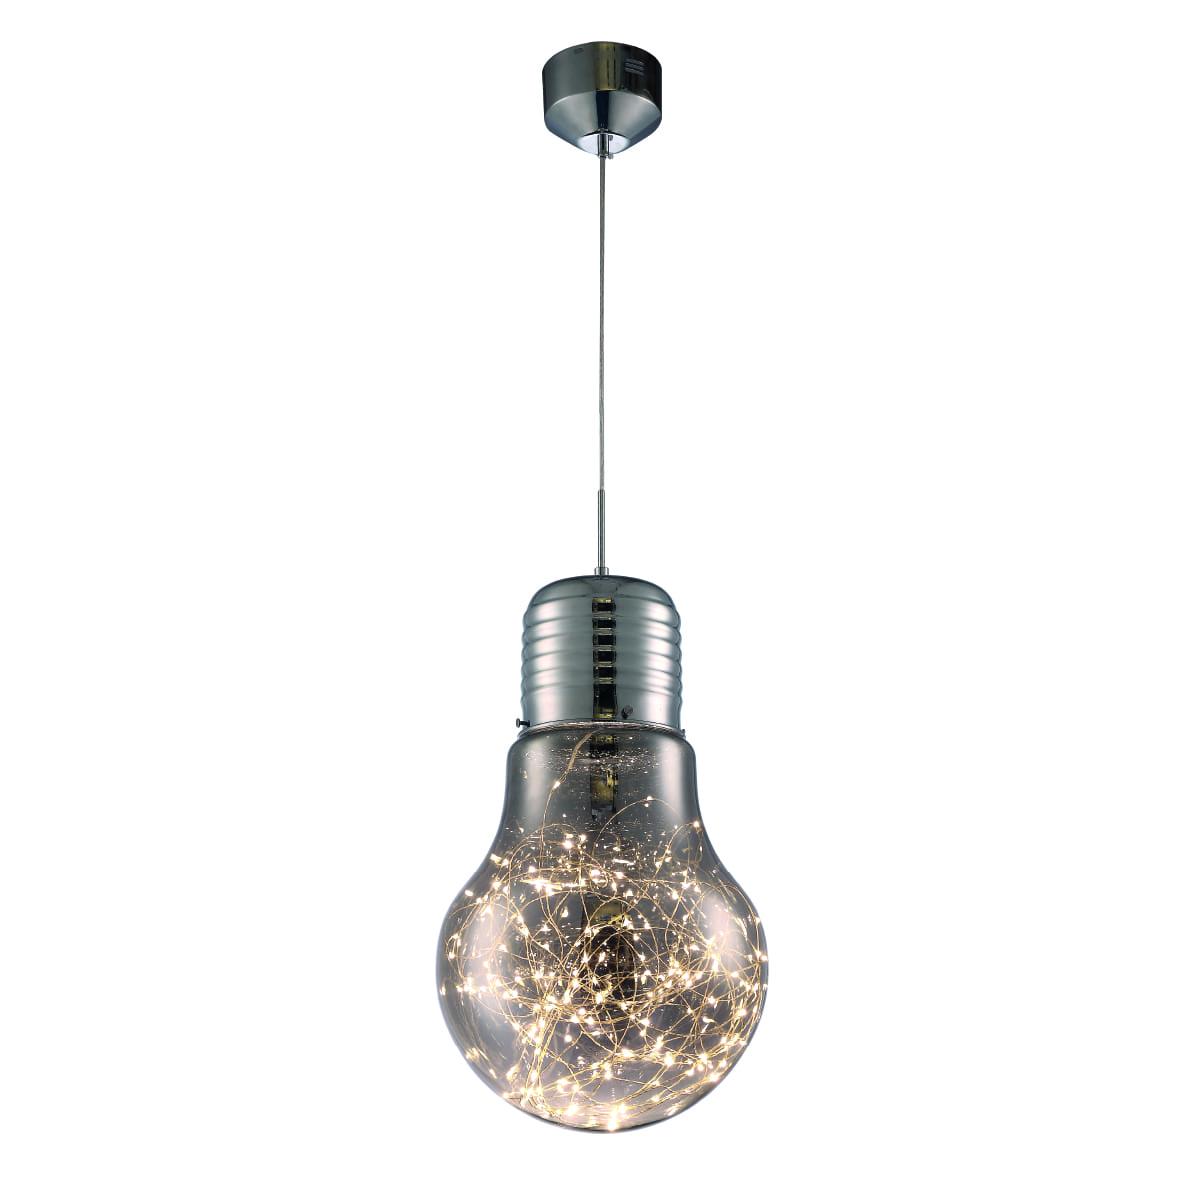 Lampa suspendată Milagro BULB 134 Chrome 13W